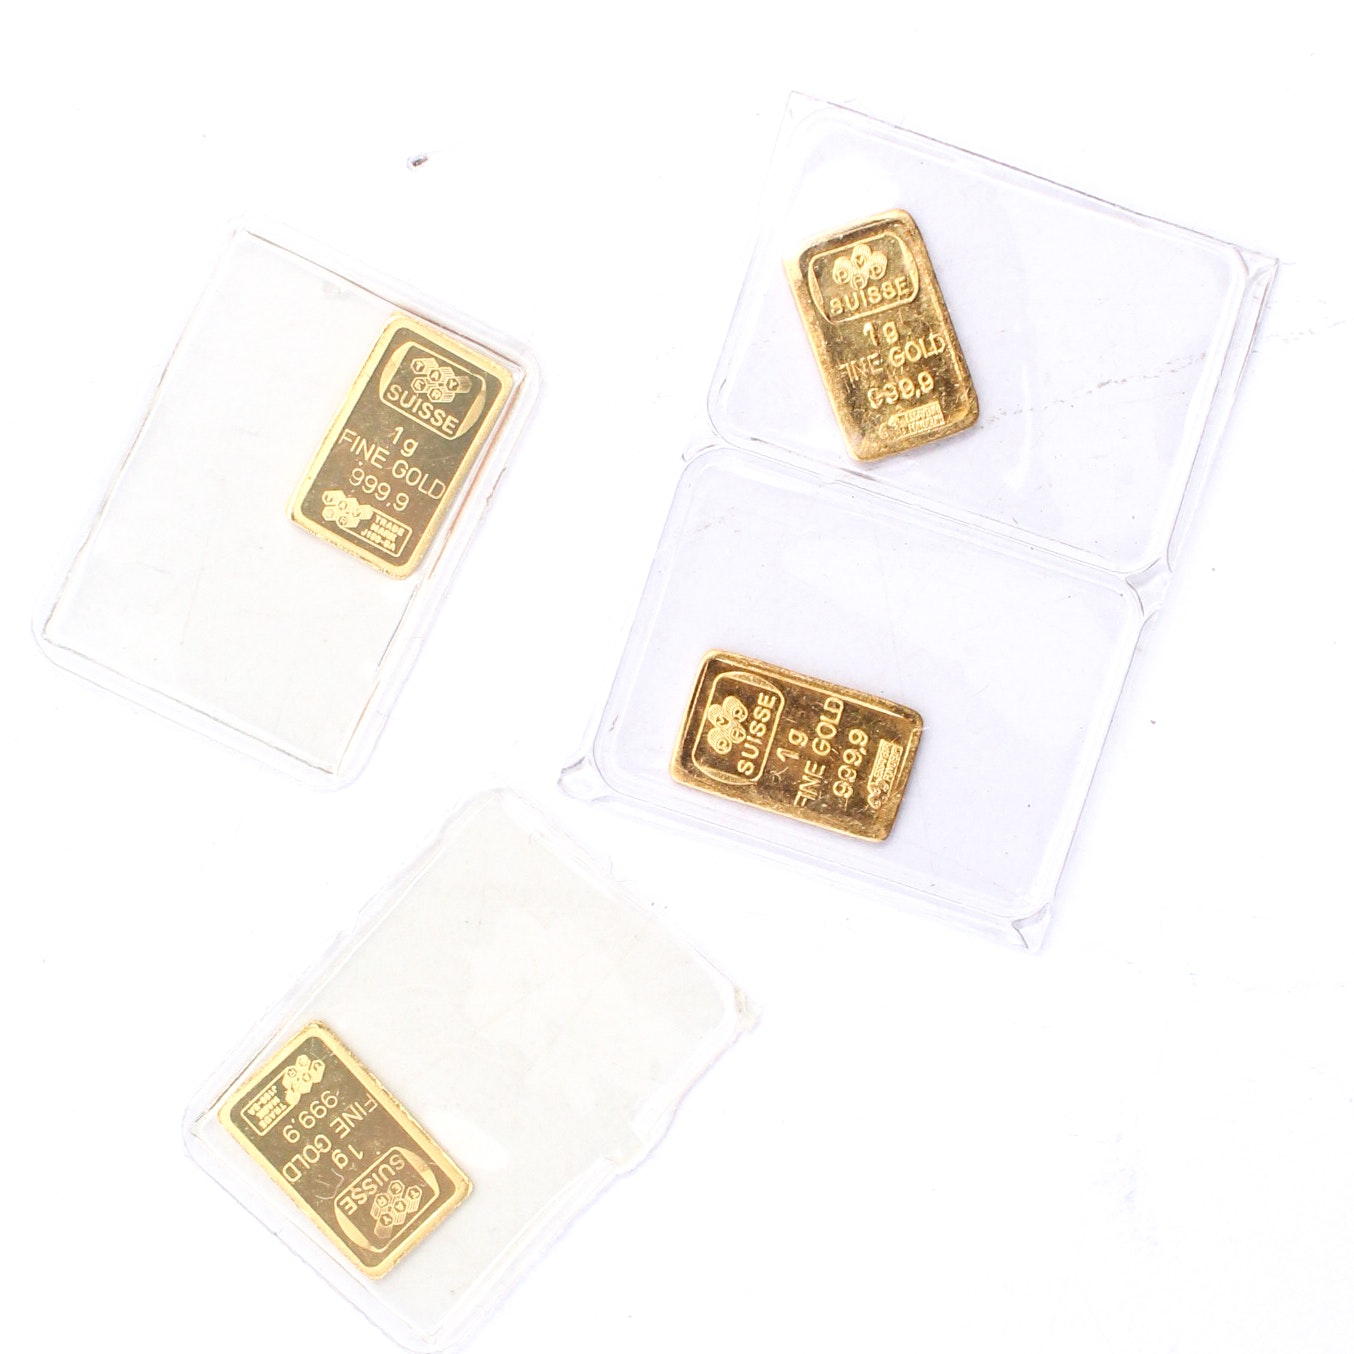 PAMP Suisse .999 One Gram Fine Gold Ingots